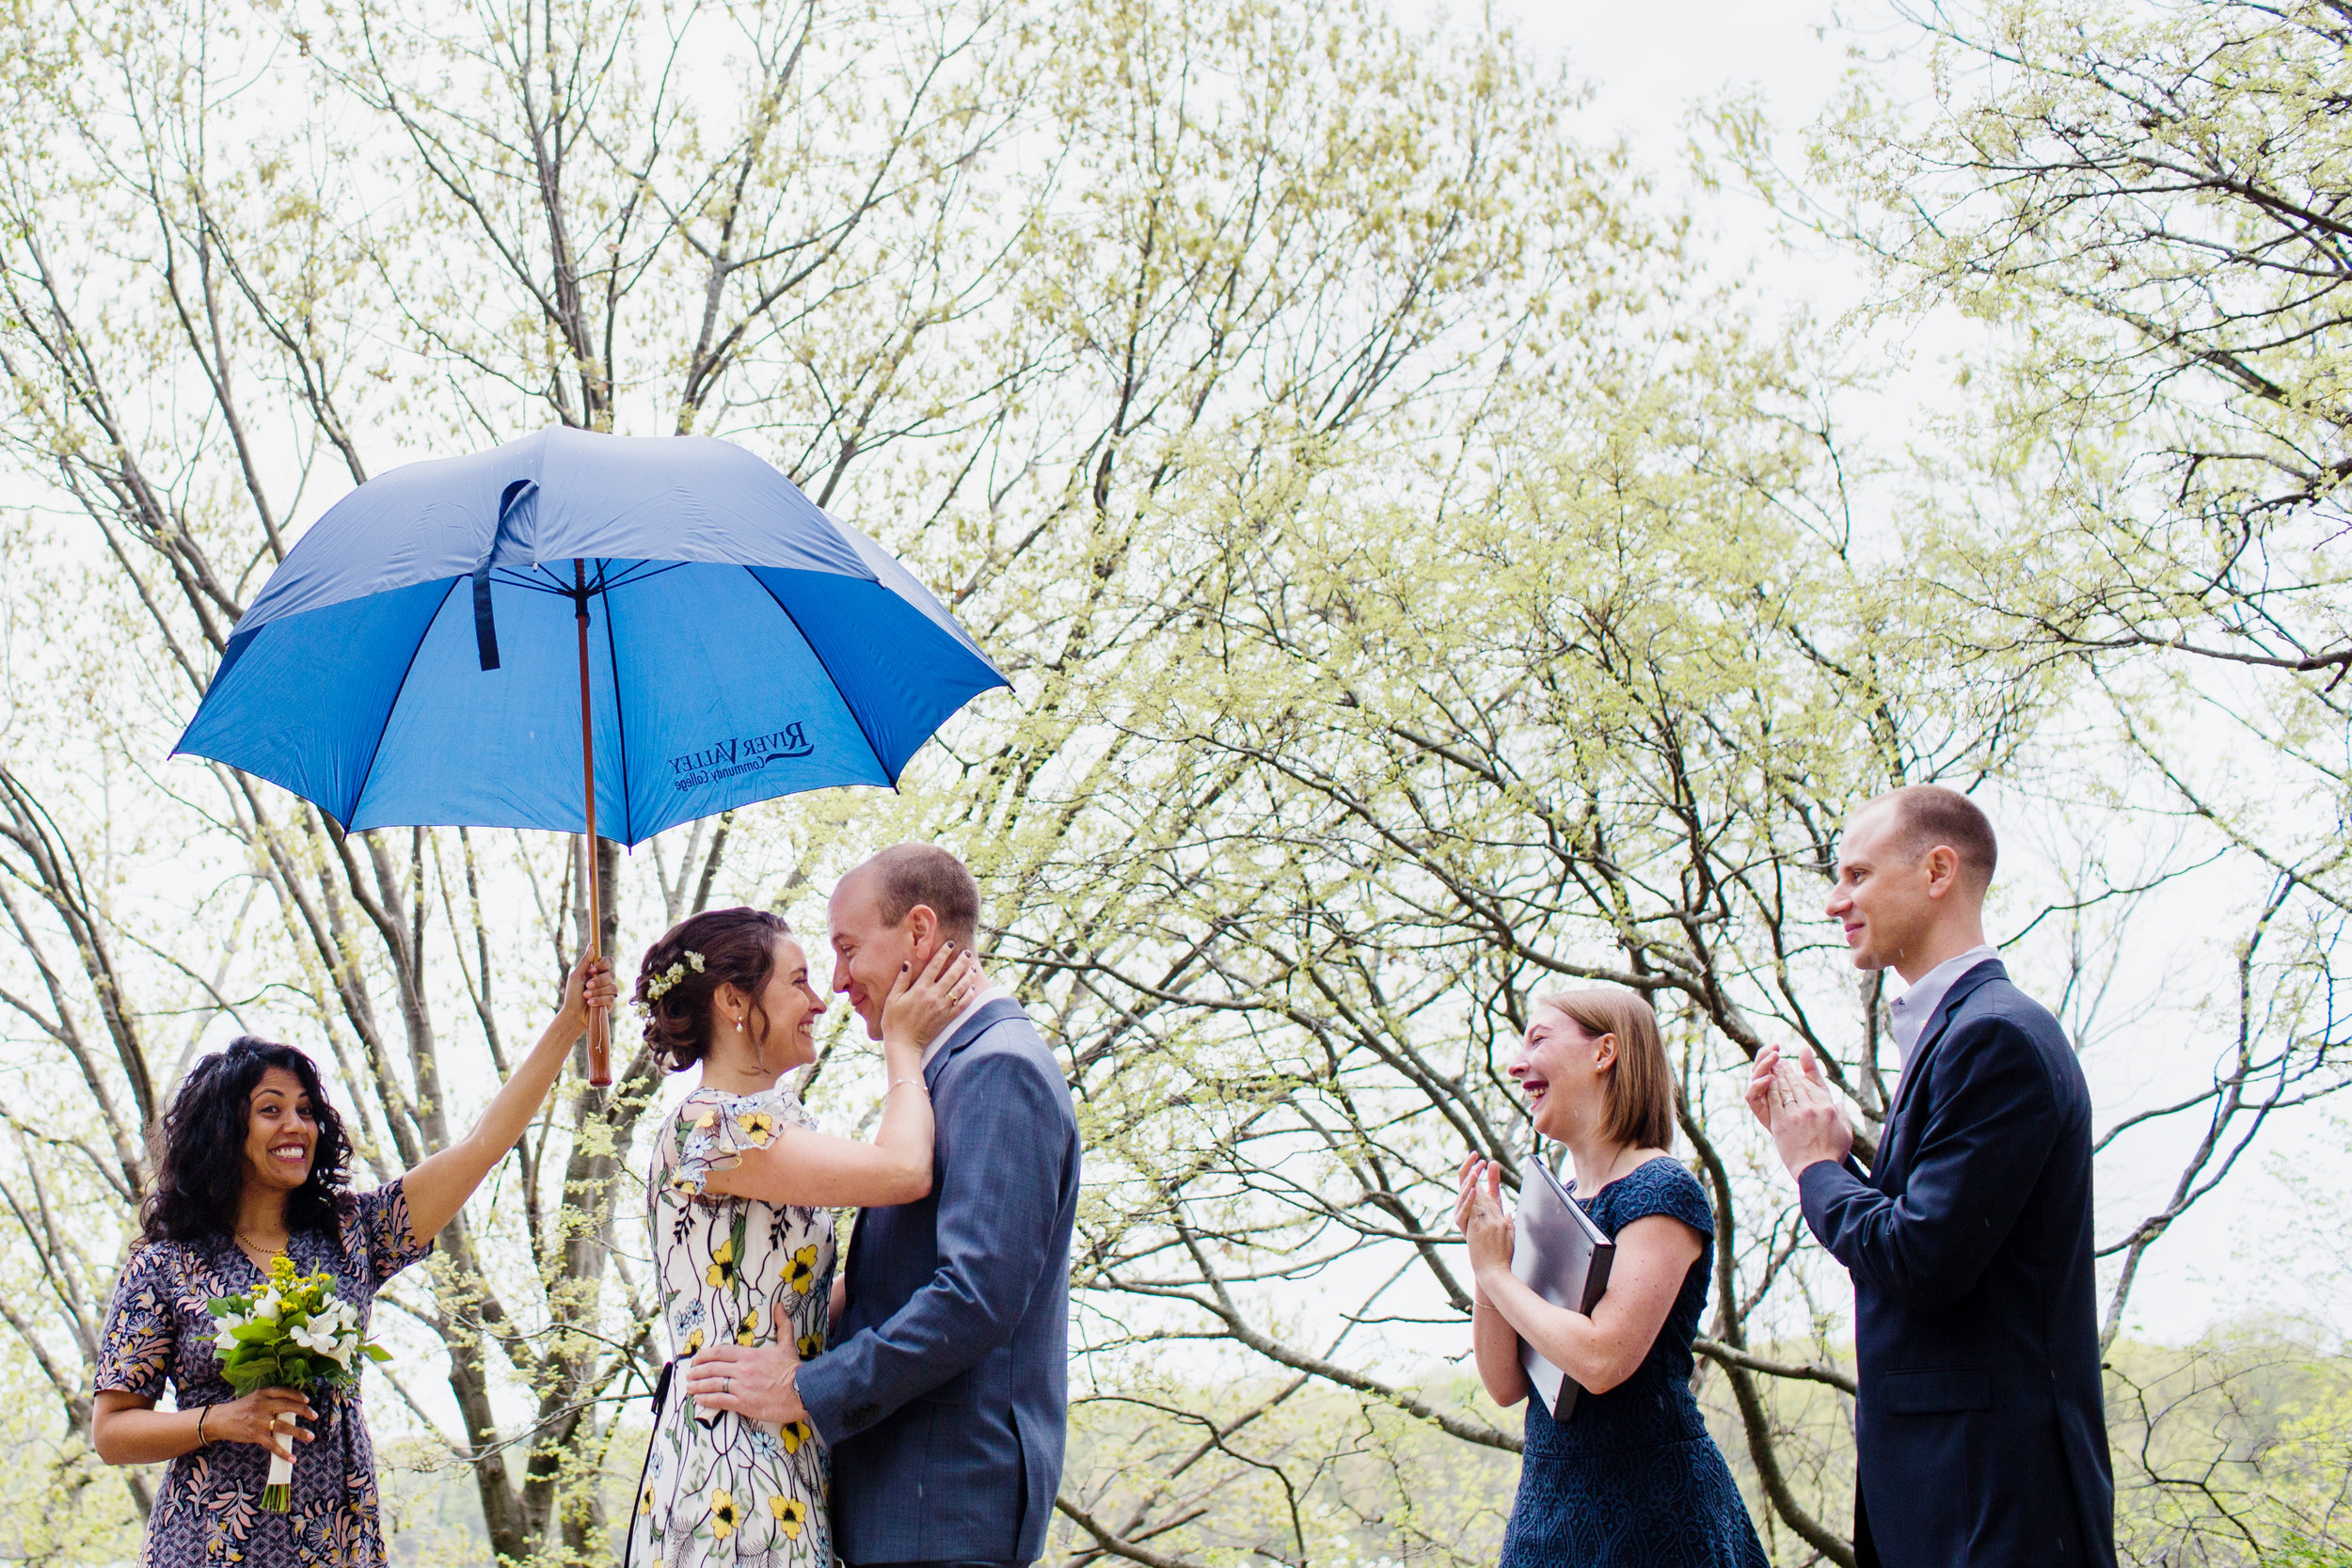 Fresh-pond-wedding-cambridge-ma-010.JPG